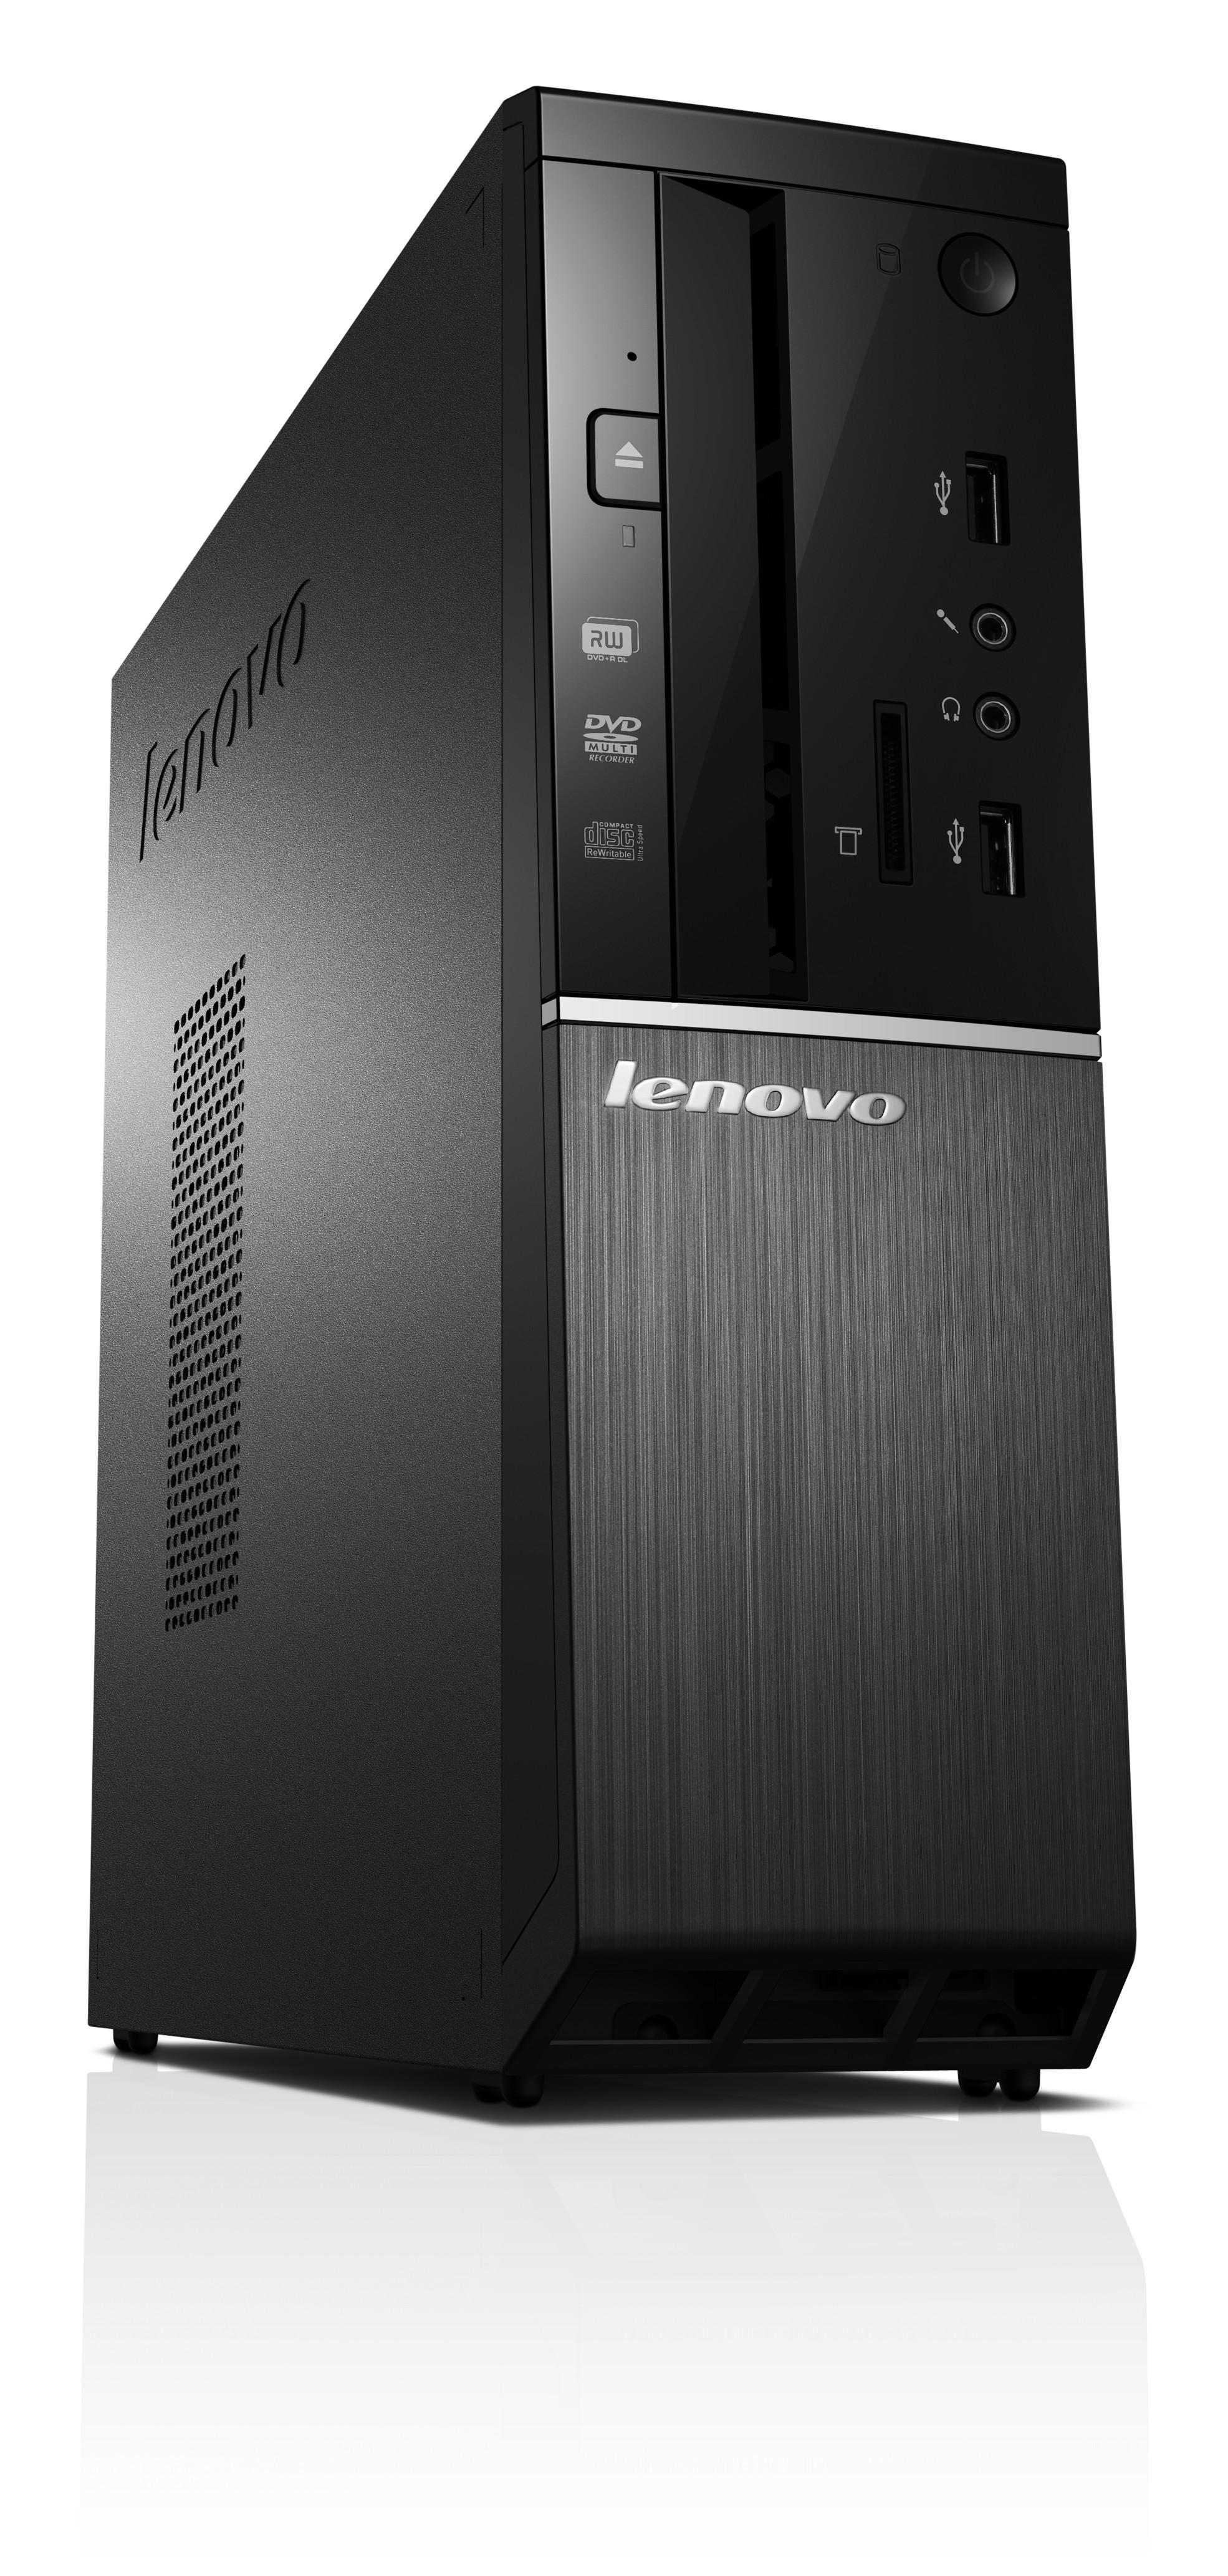 Lenovo IdeaCentre 300S Celeron-DC G1840 2,80GHz/4GB/500GB/DVD-RW/WIN10 90F1001DCK